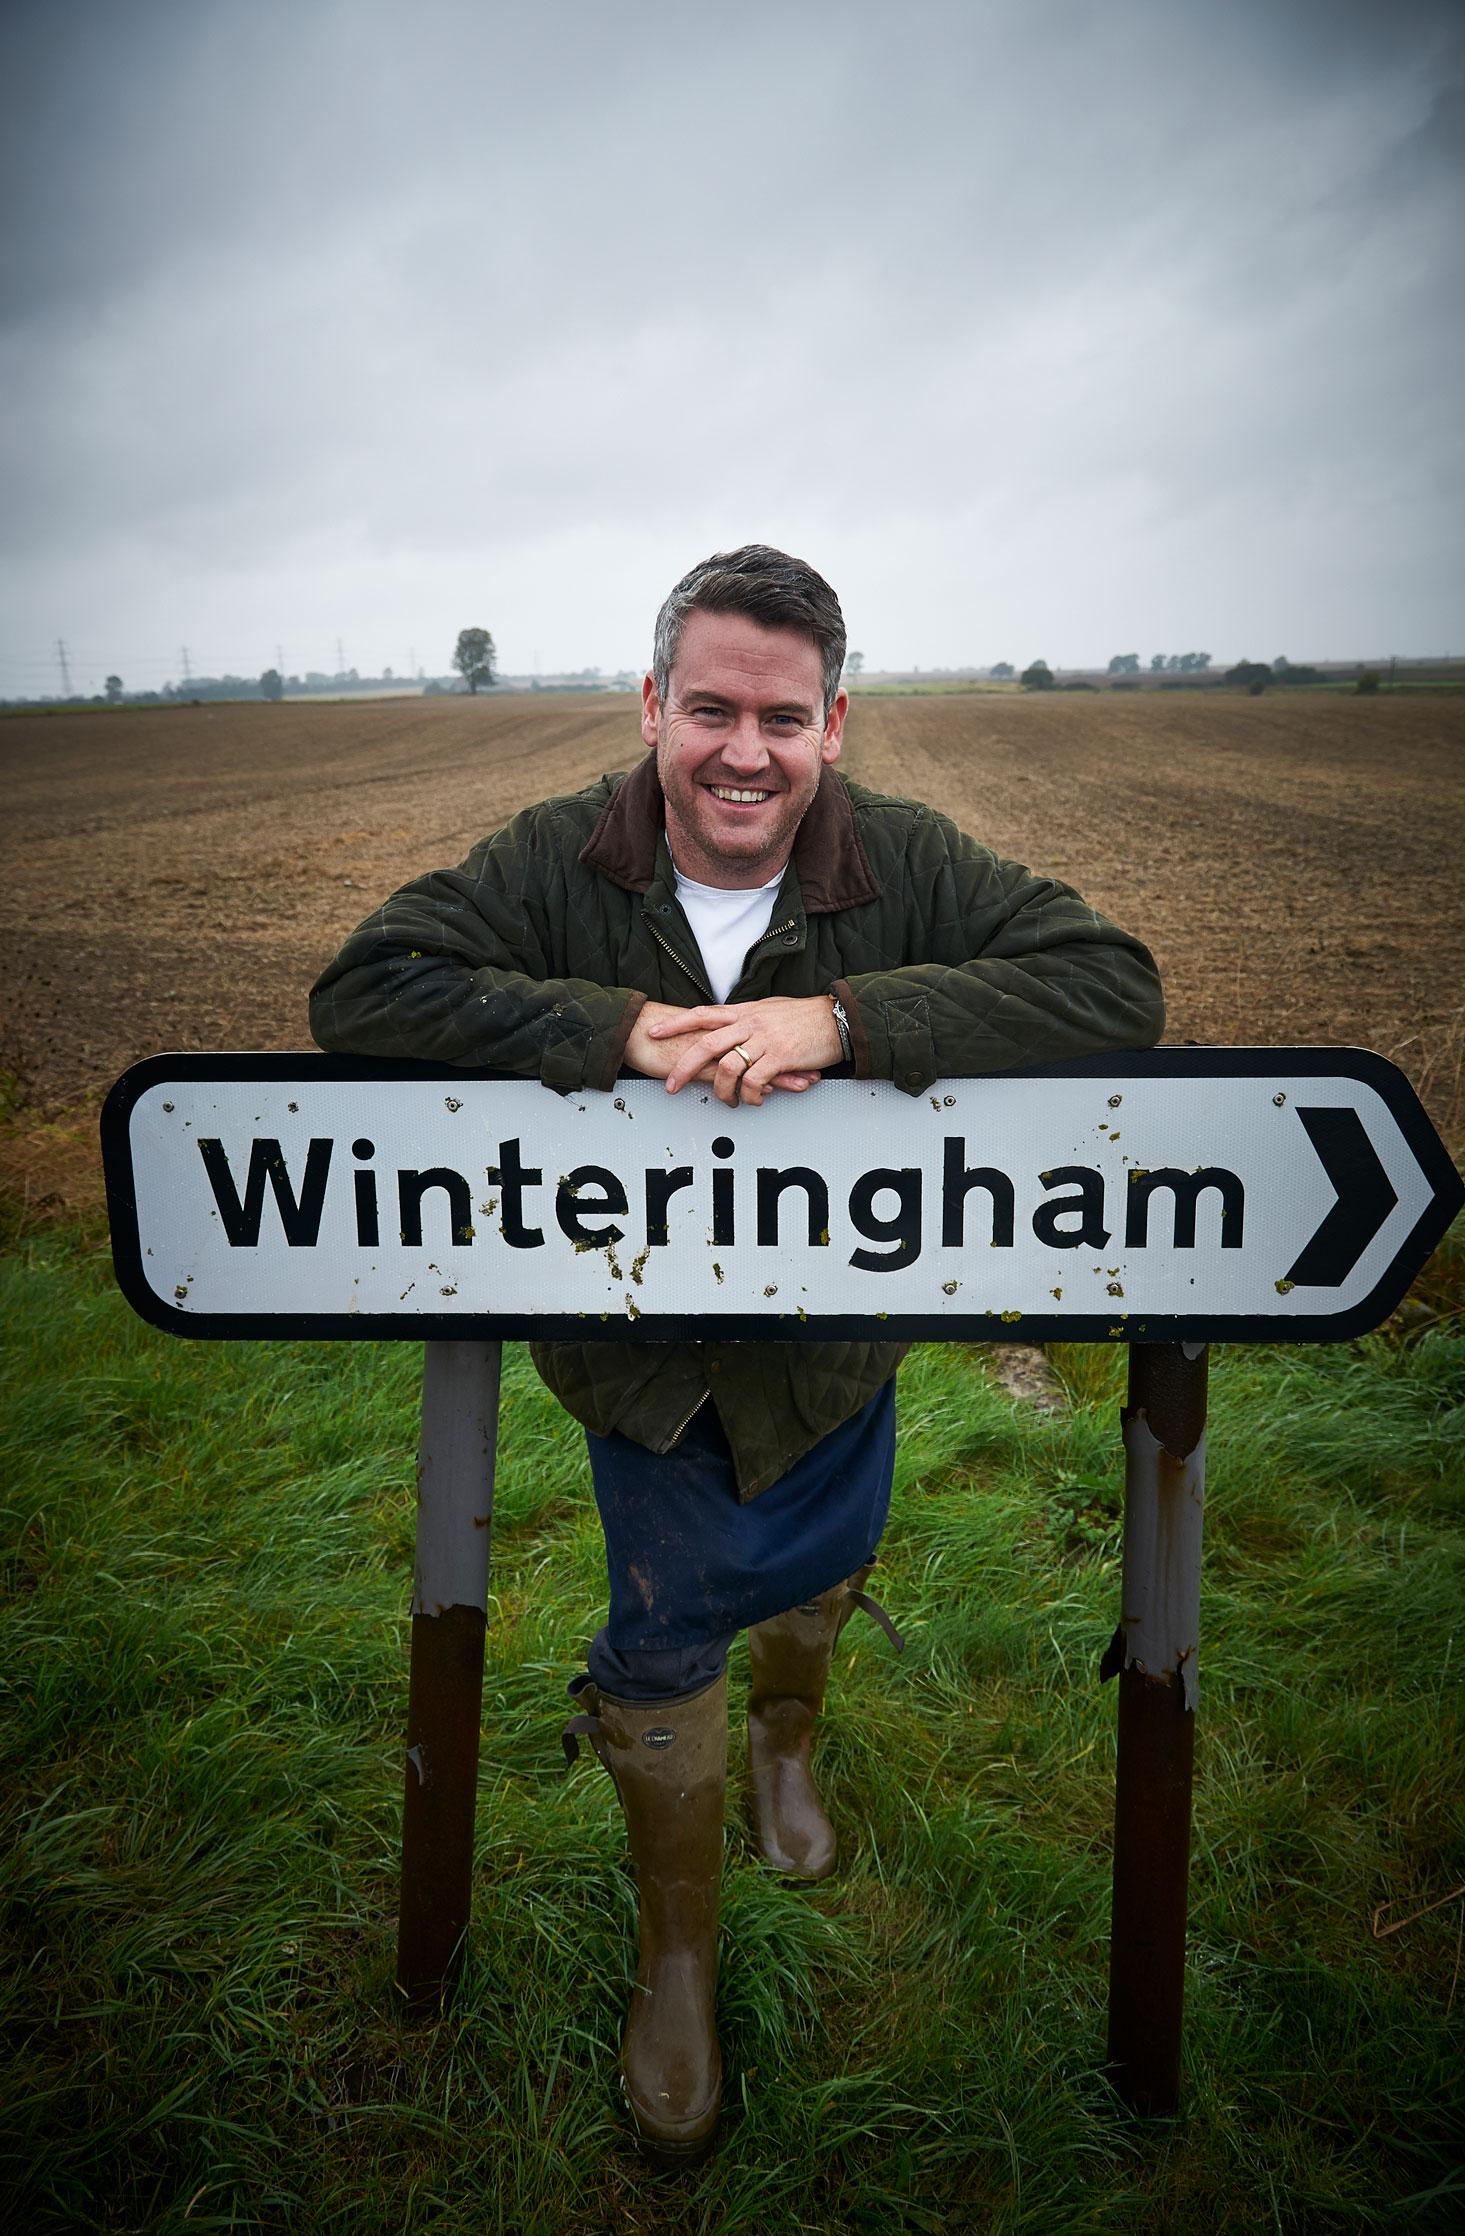 © Colin McGurran, Winteringham fields